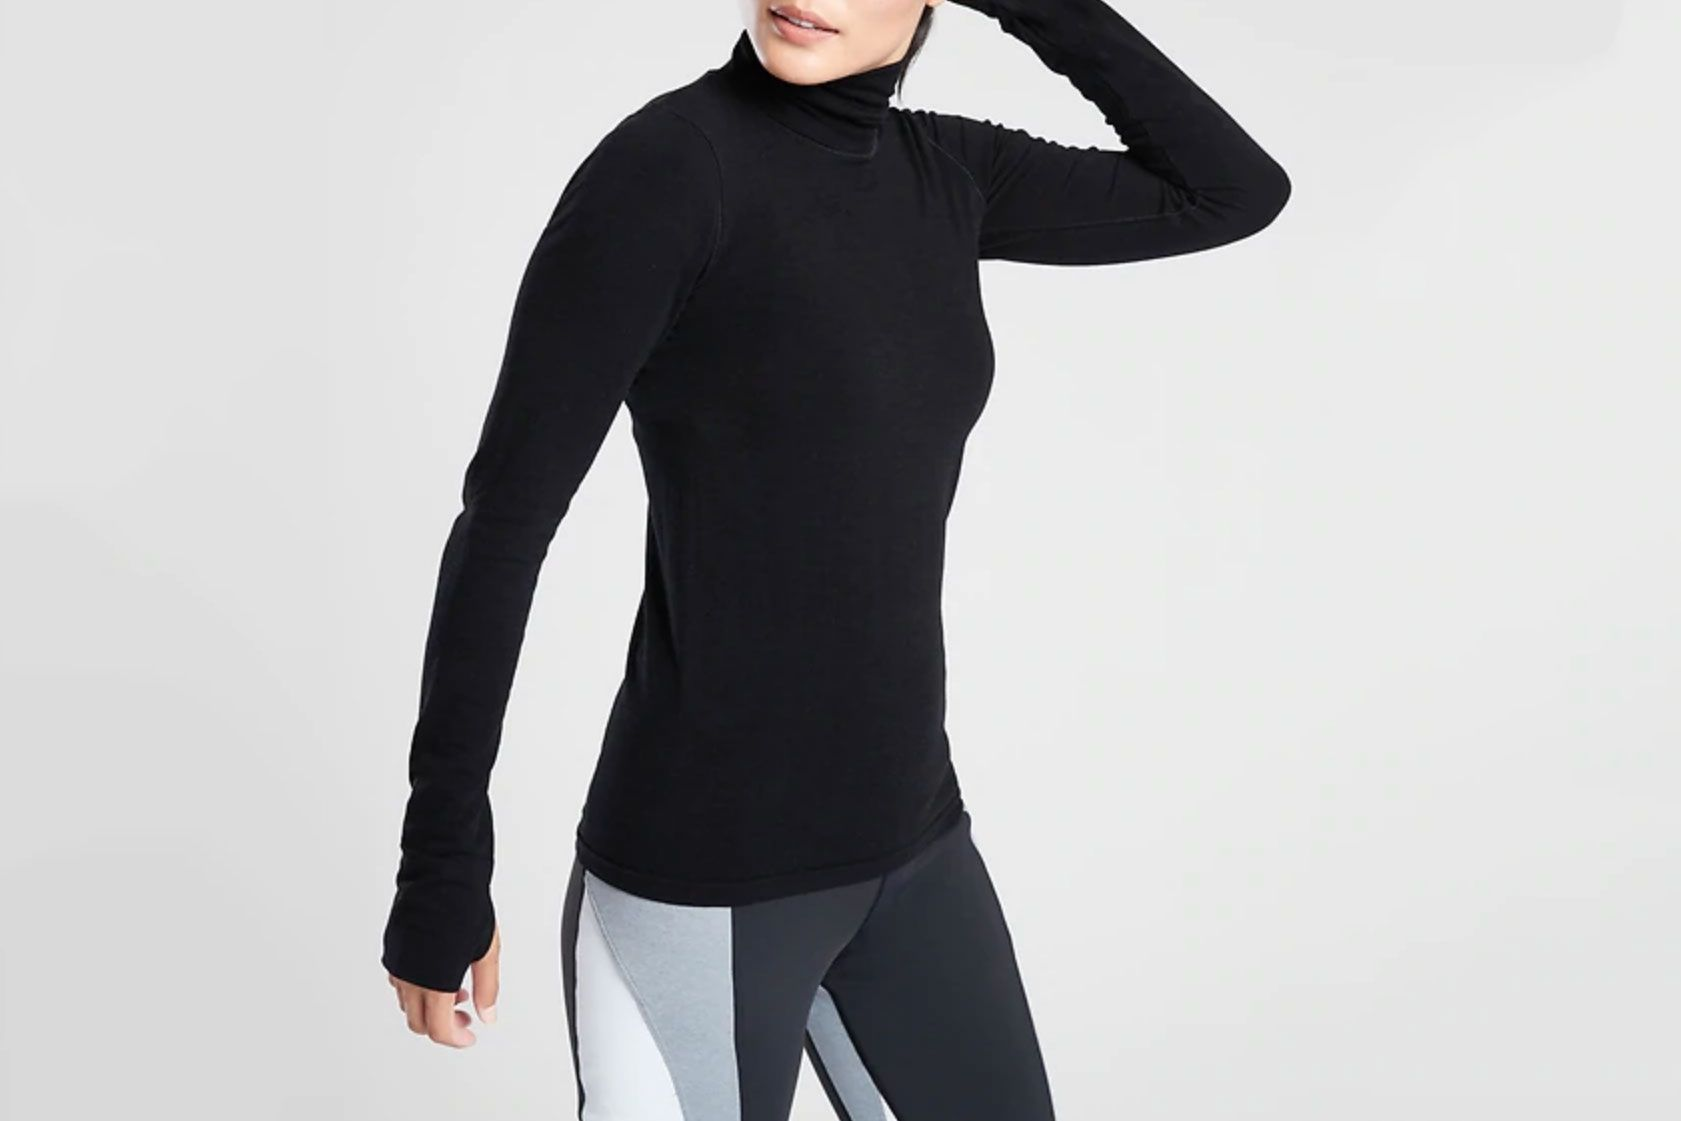 Athleta Foresthill Merino-Wool Ascent Turtleneck